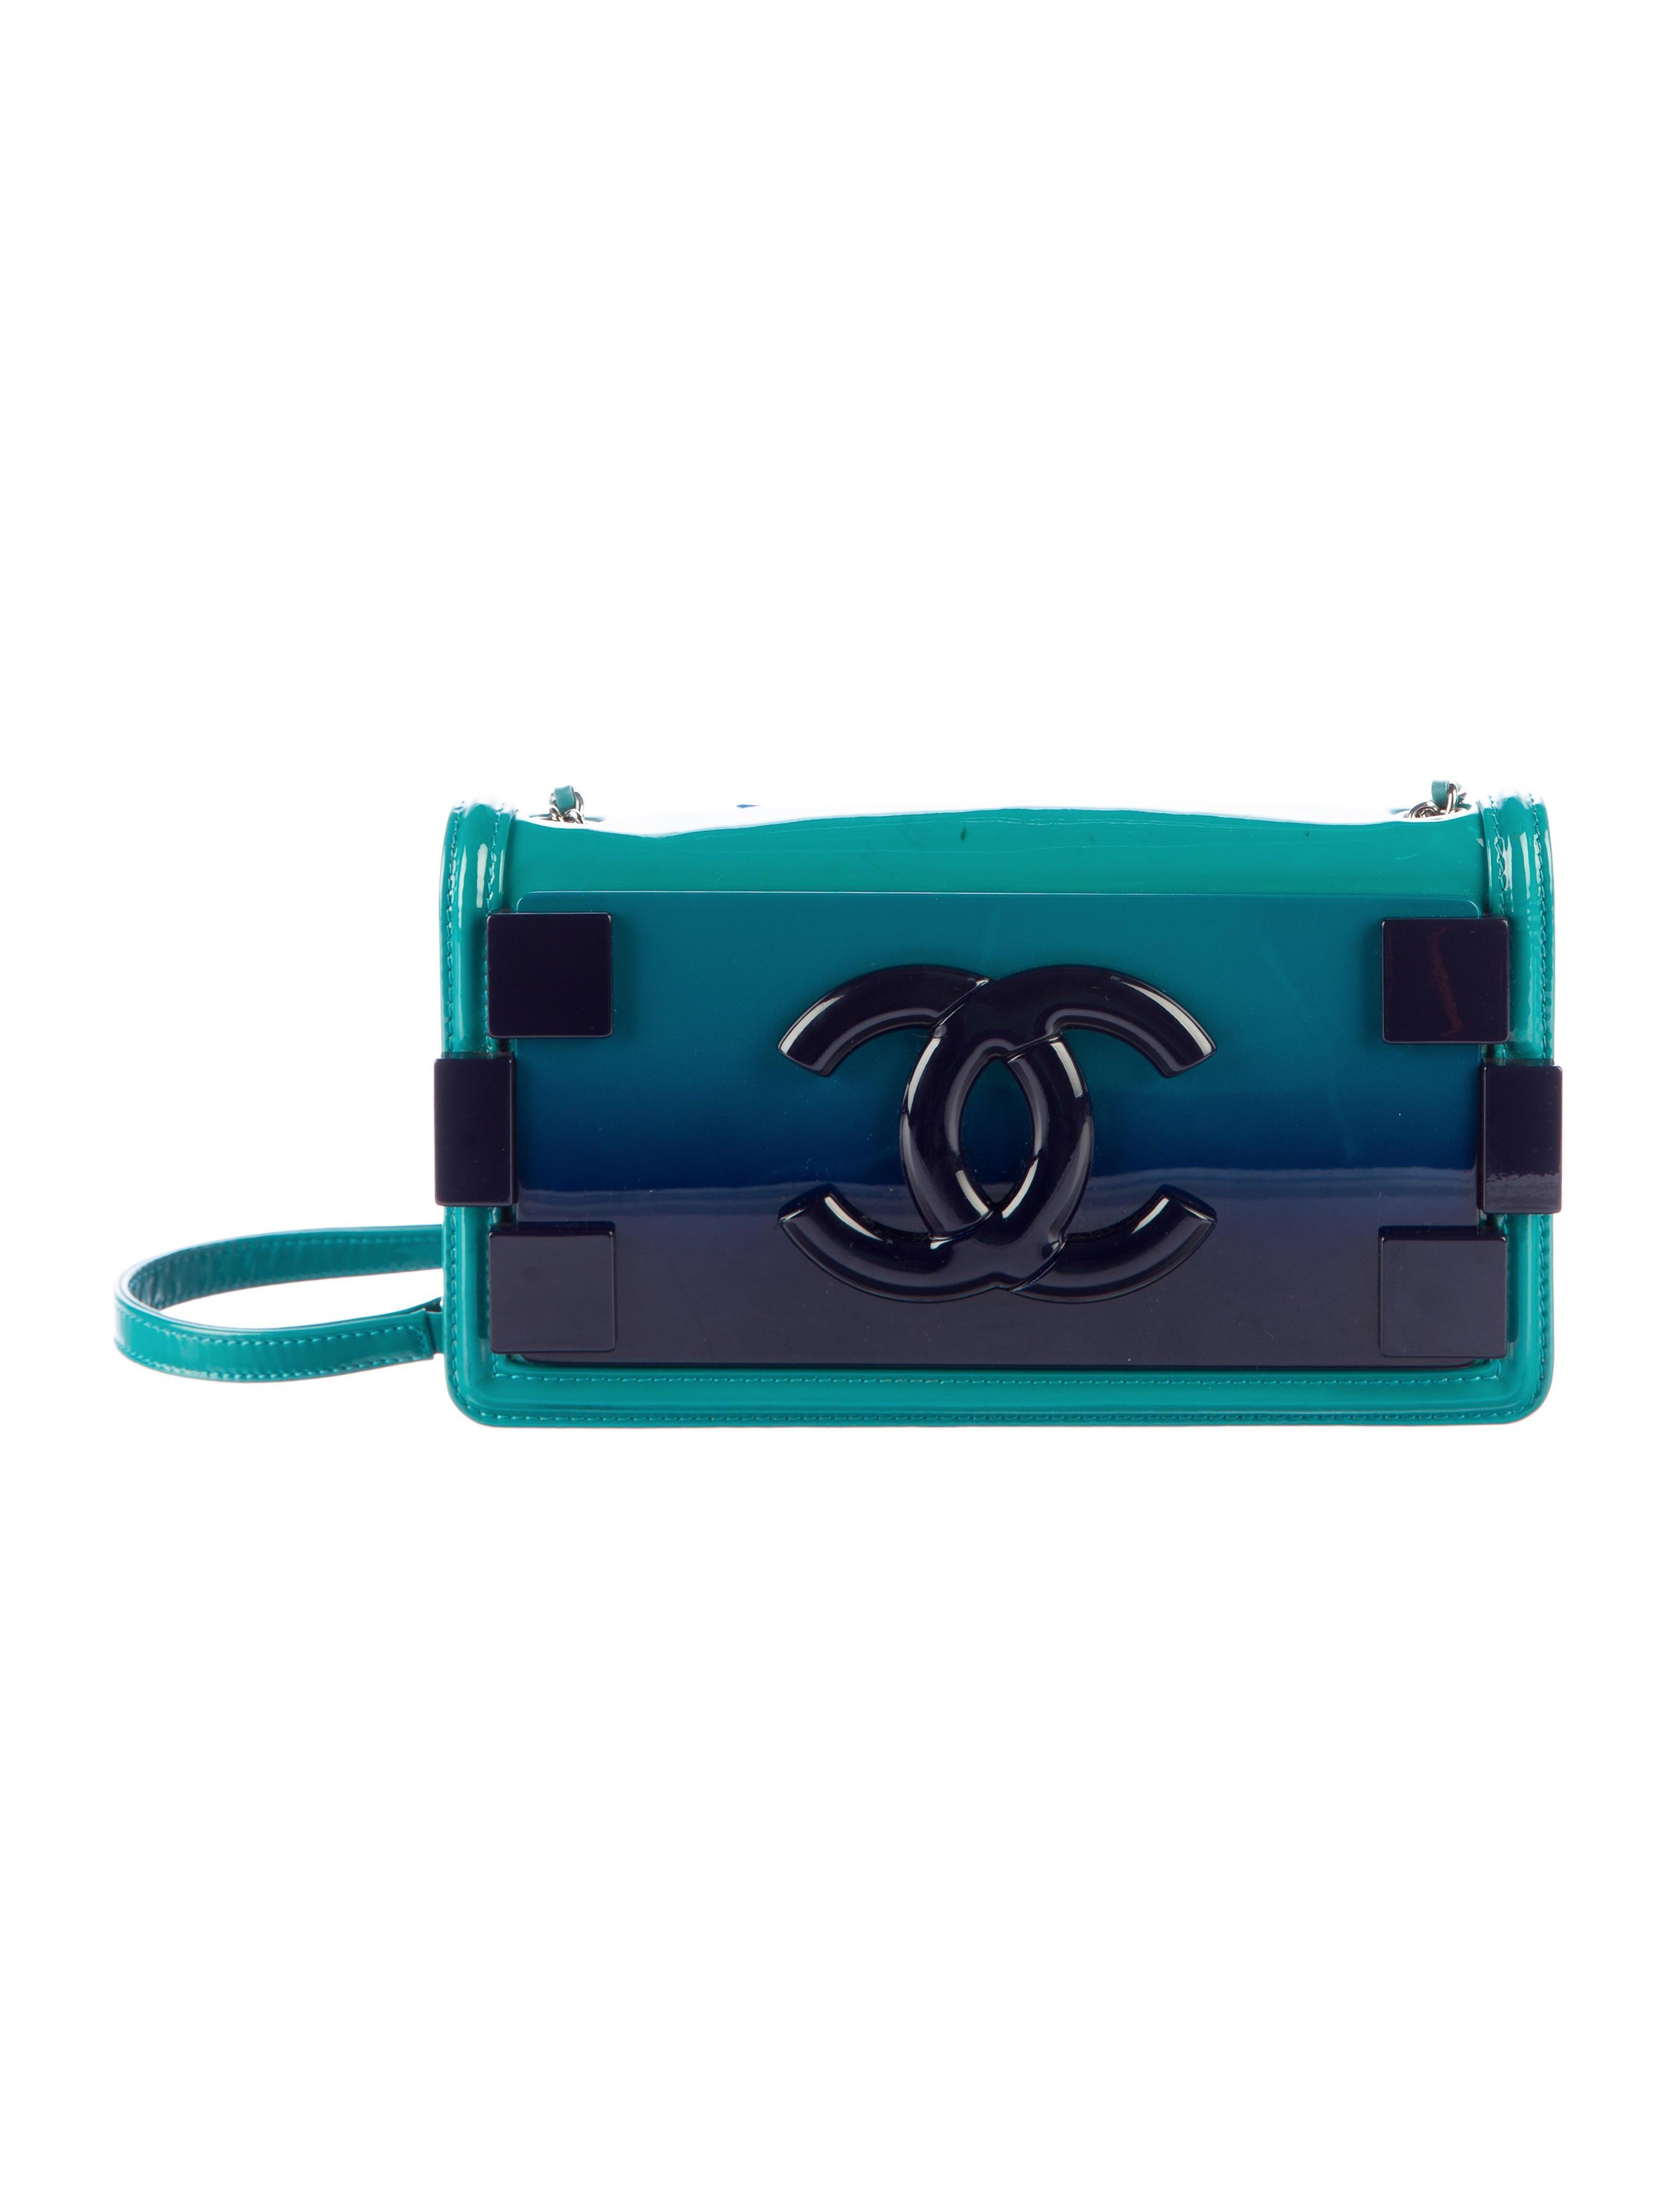 19ecd07274b8 Chanel Boy Brick Horizontal Flap Bag - Handbags - CHA148144